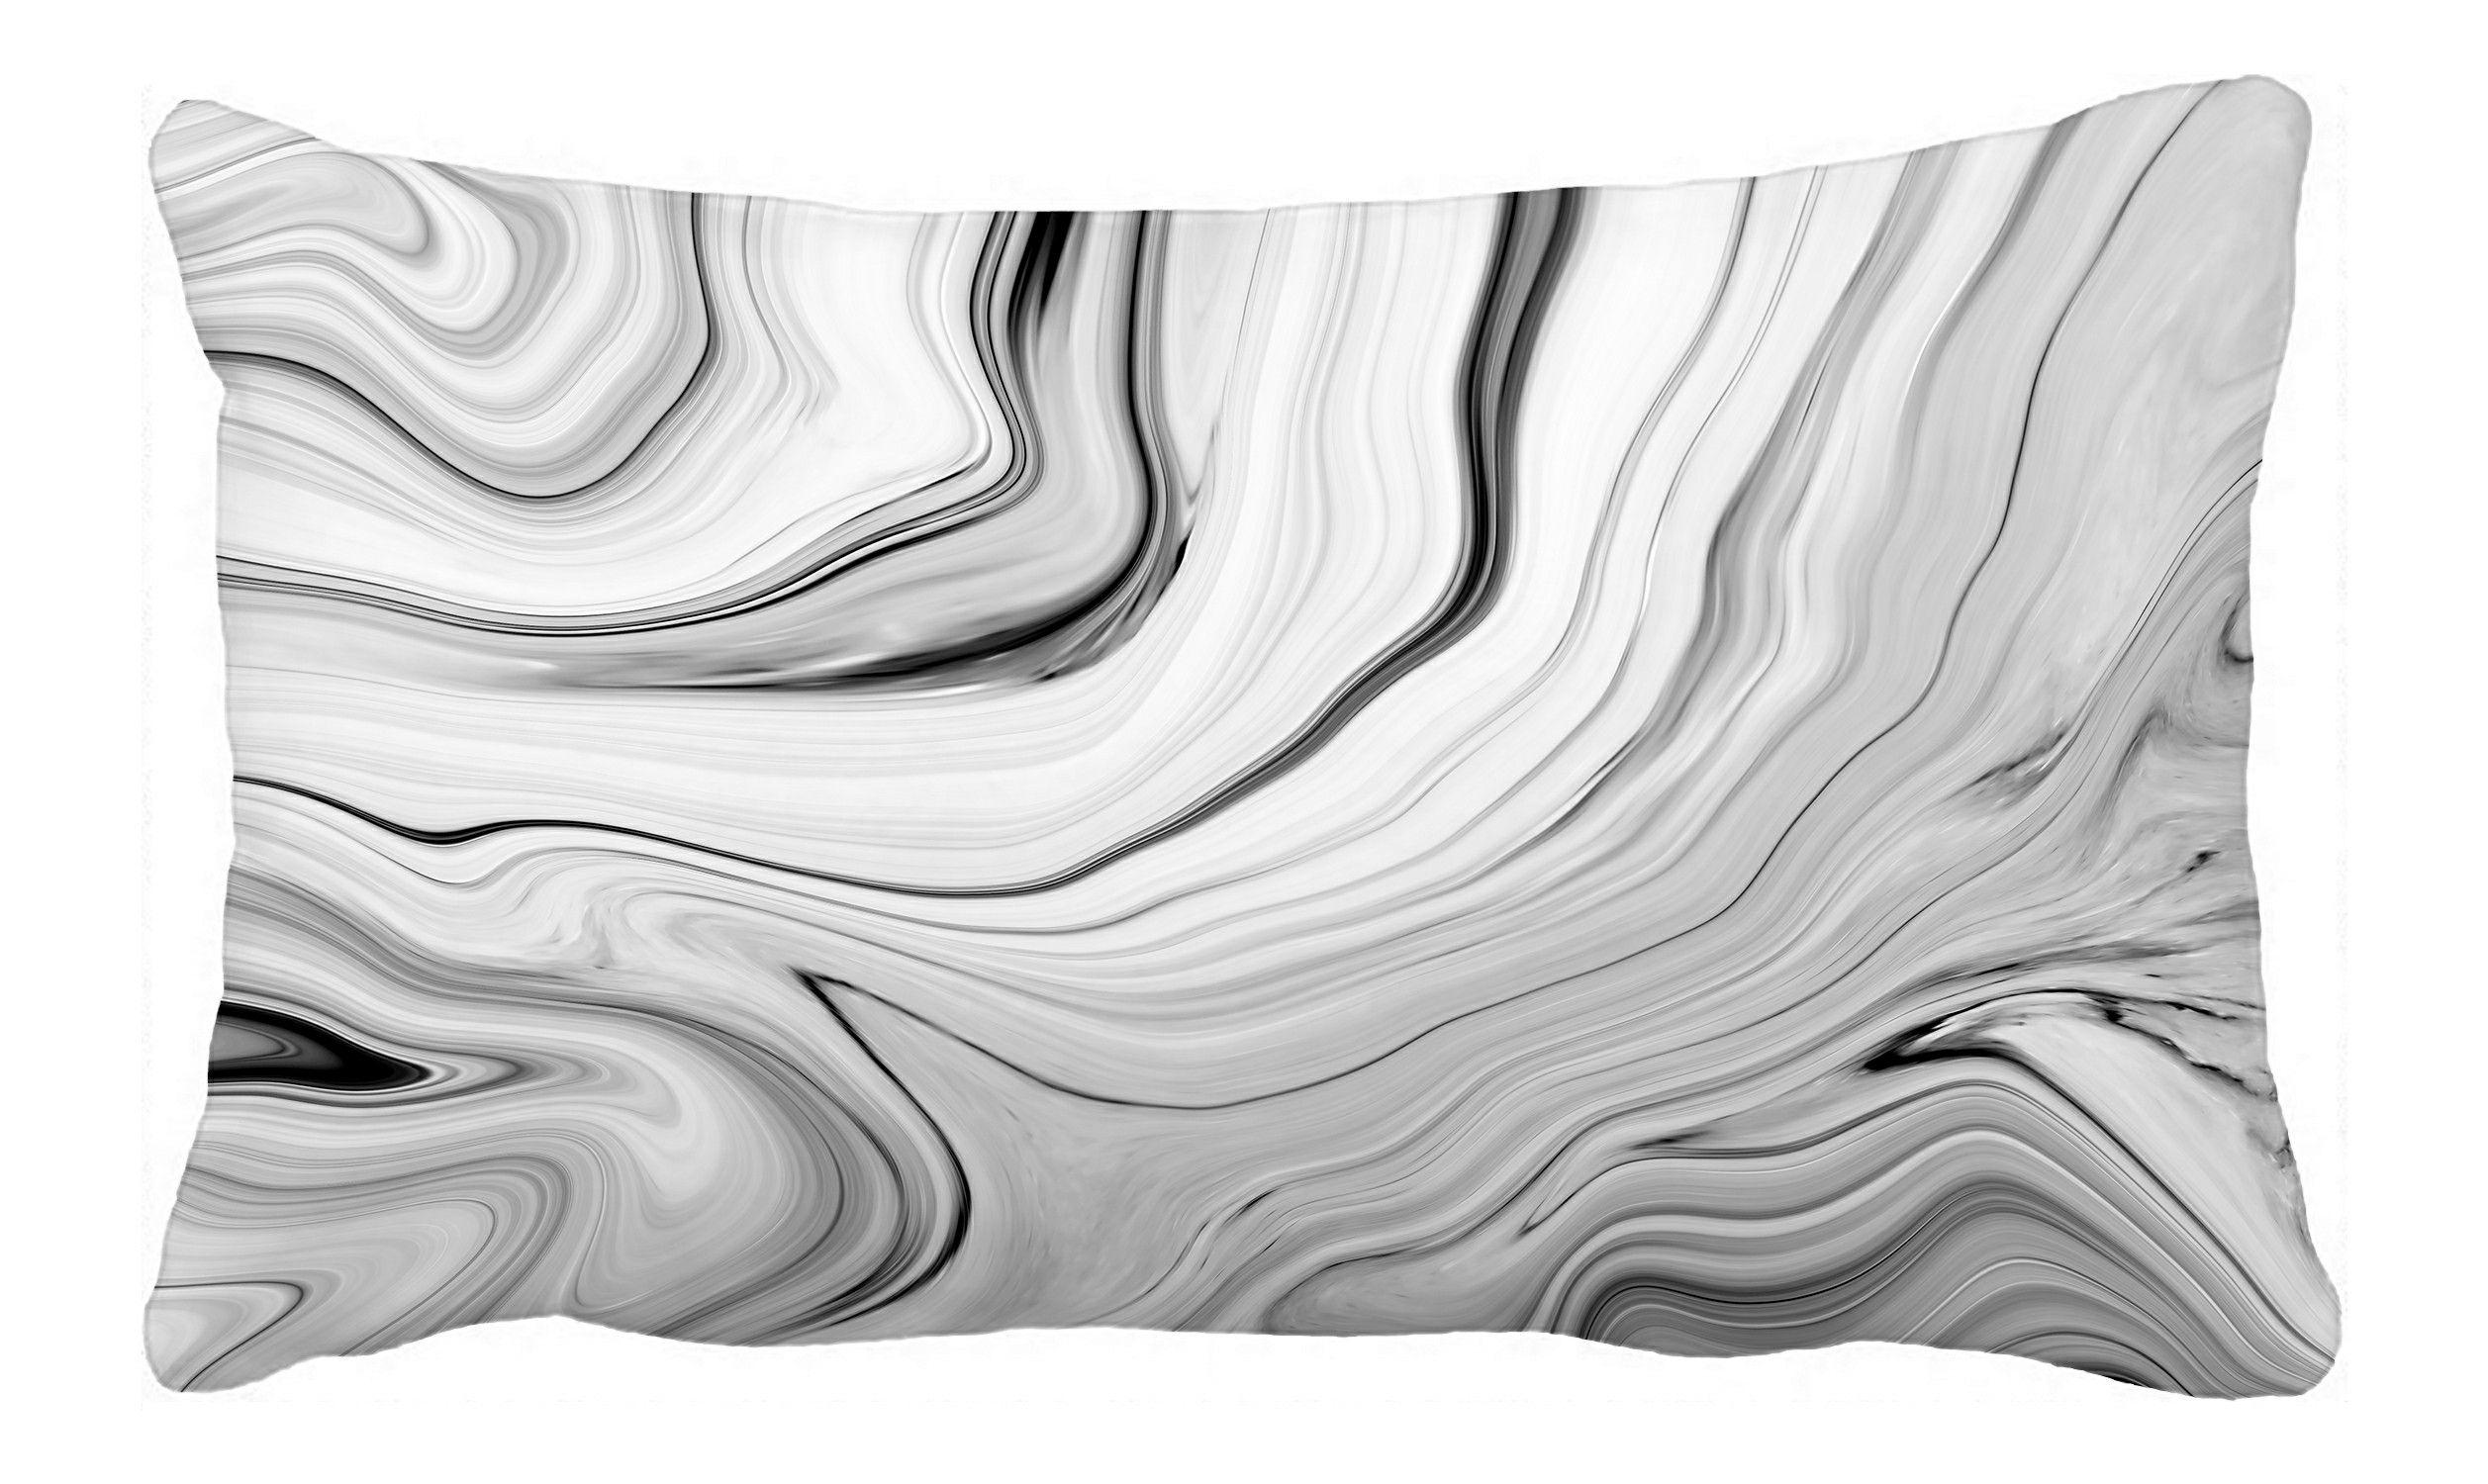 ECZJNT marble texture Black white Handmade technique Pillow Case Pillow Cover Cushion Cover 20x30 Inch